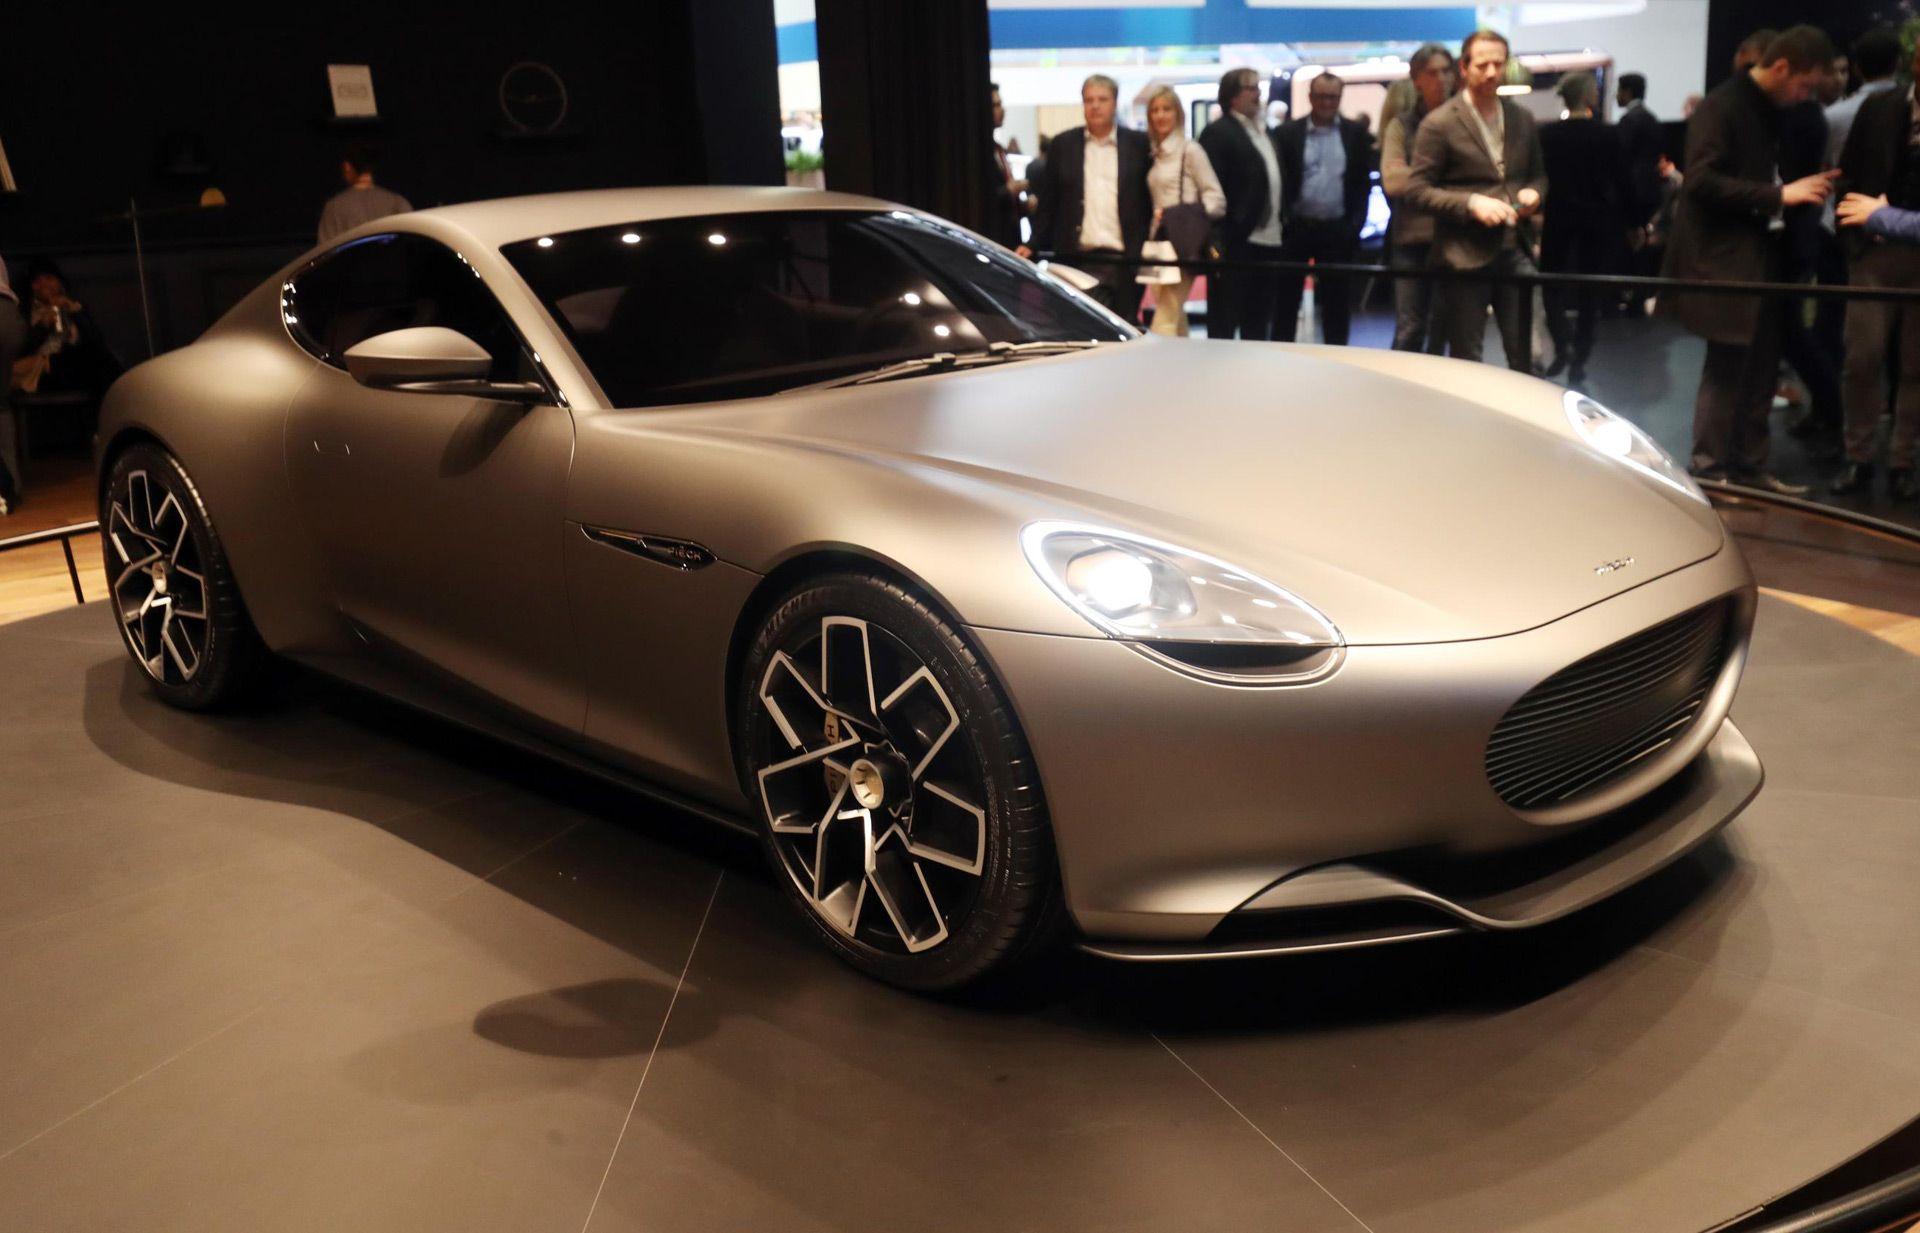 Piech family member starts car brand, plans electric